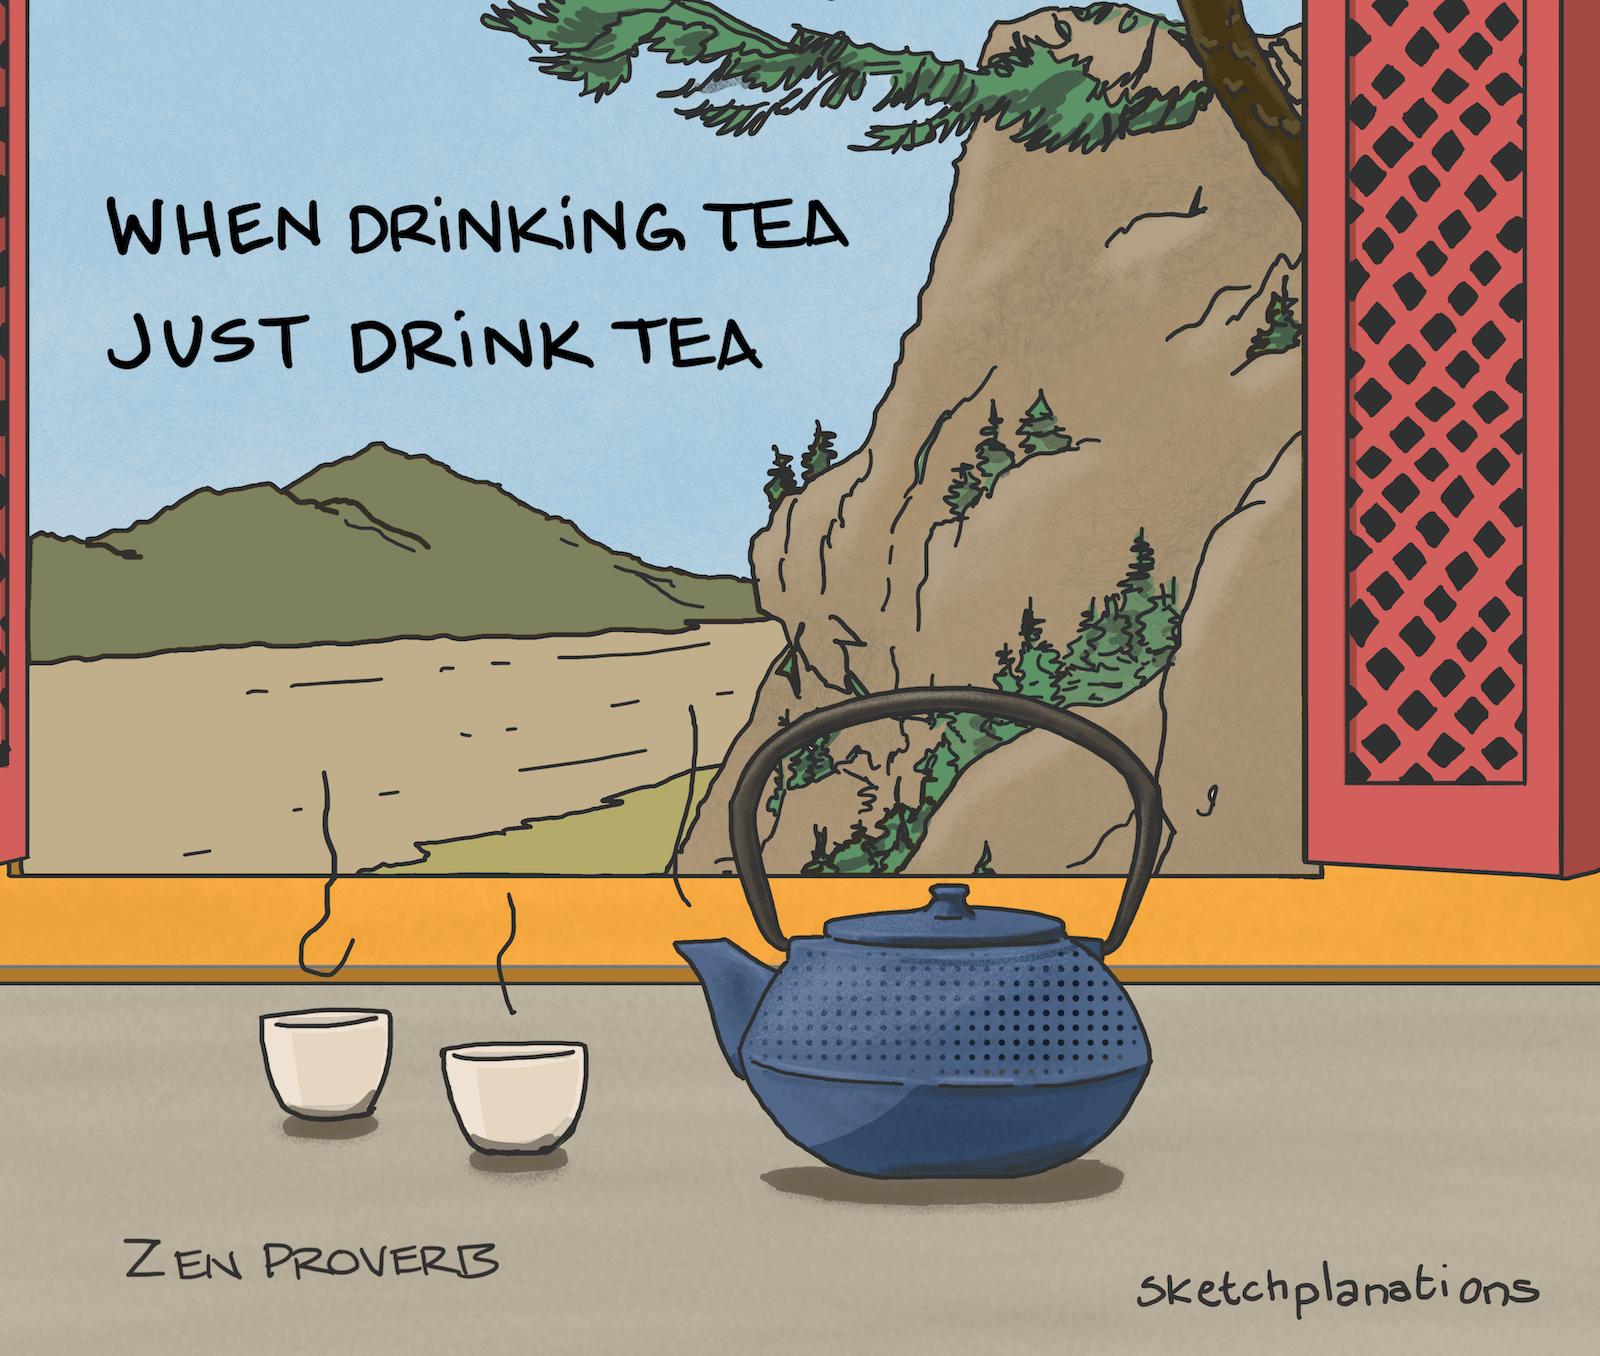 https://sketchplanations.com/when-drinking-tea-just-drink-tea